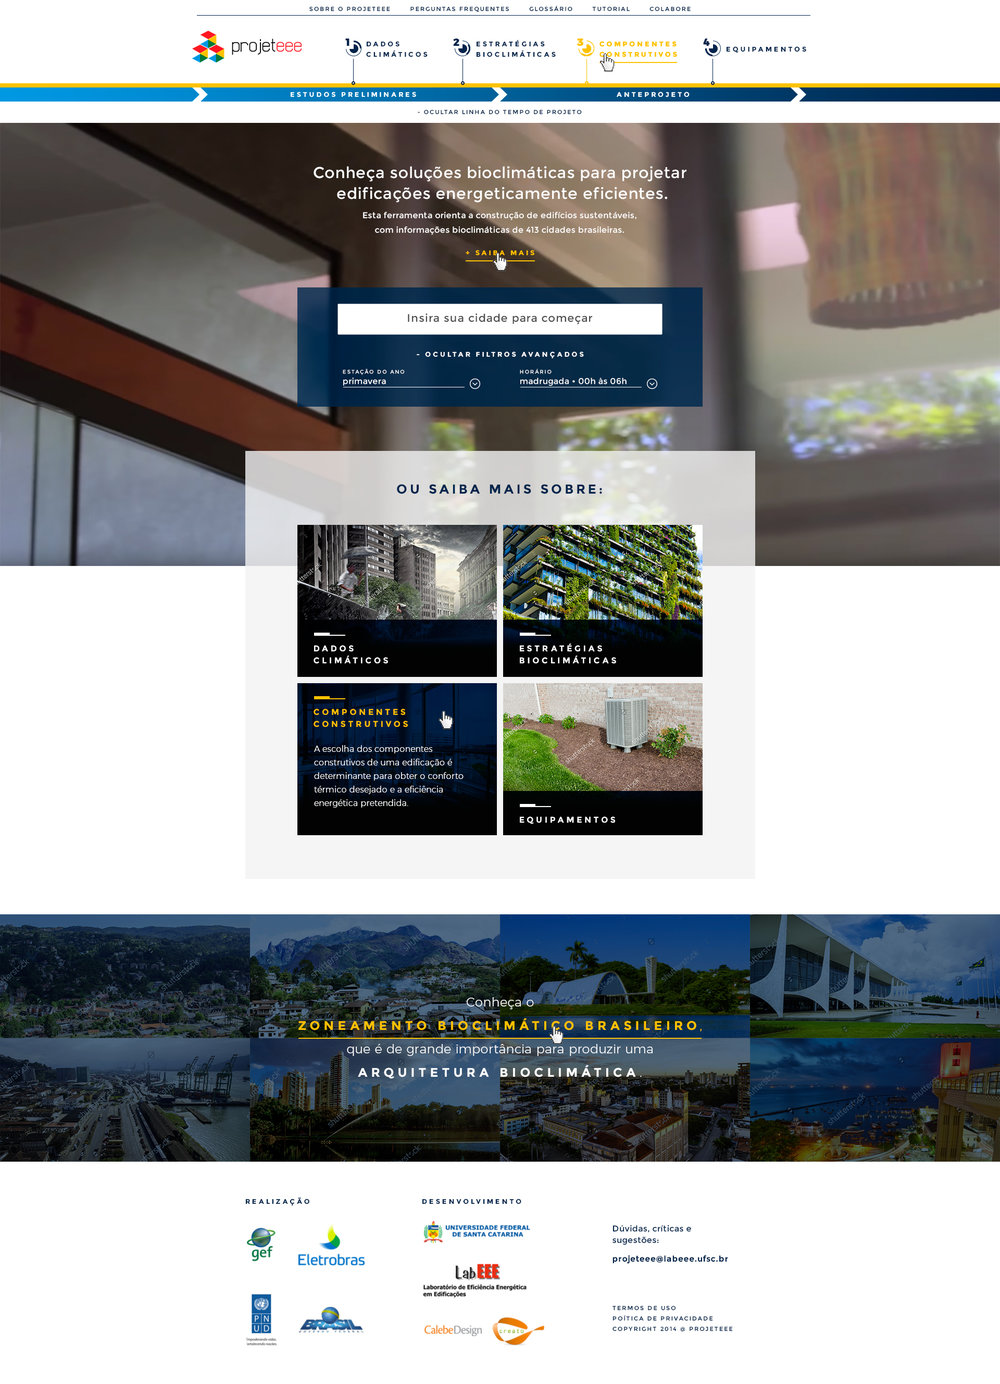 Plataforma Projeteee -http://projeteee.mma.gov.br/ Cliente: MMA (Ministério do Meio Ambiente) e PNUD